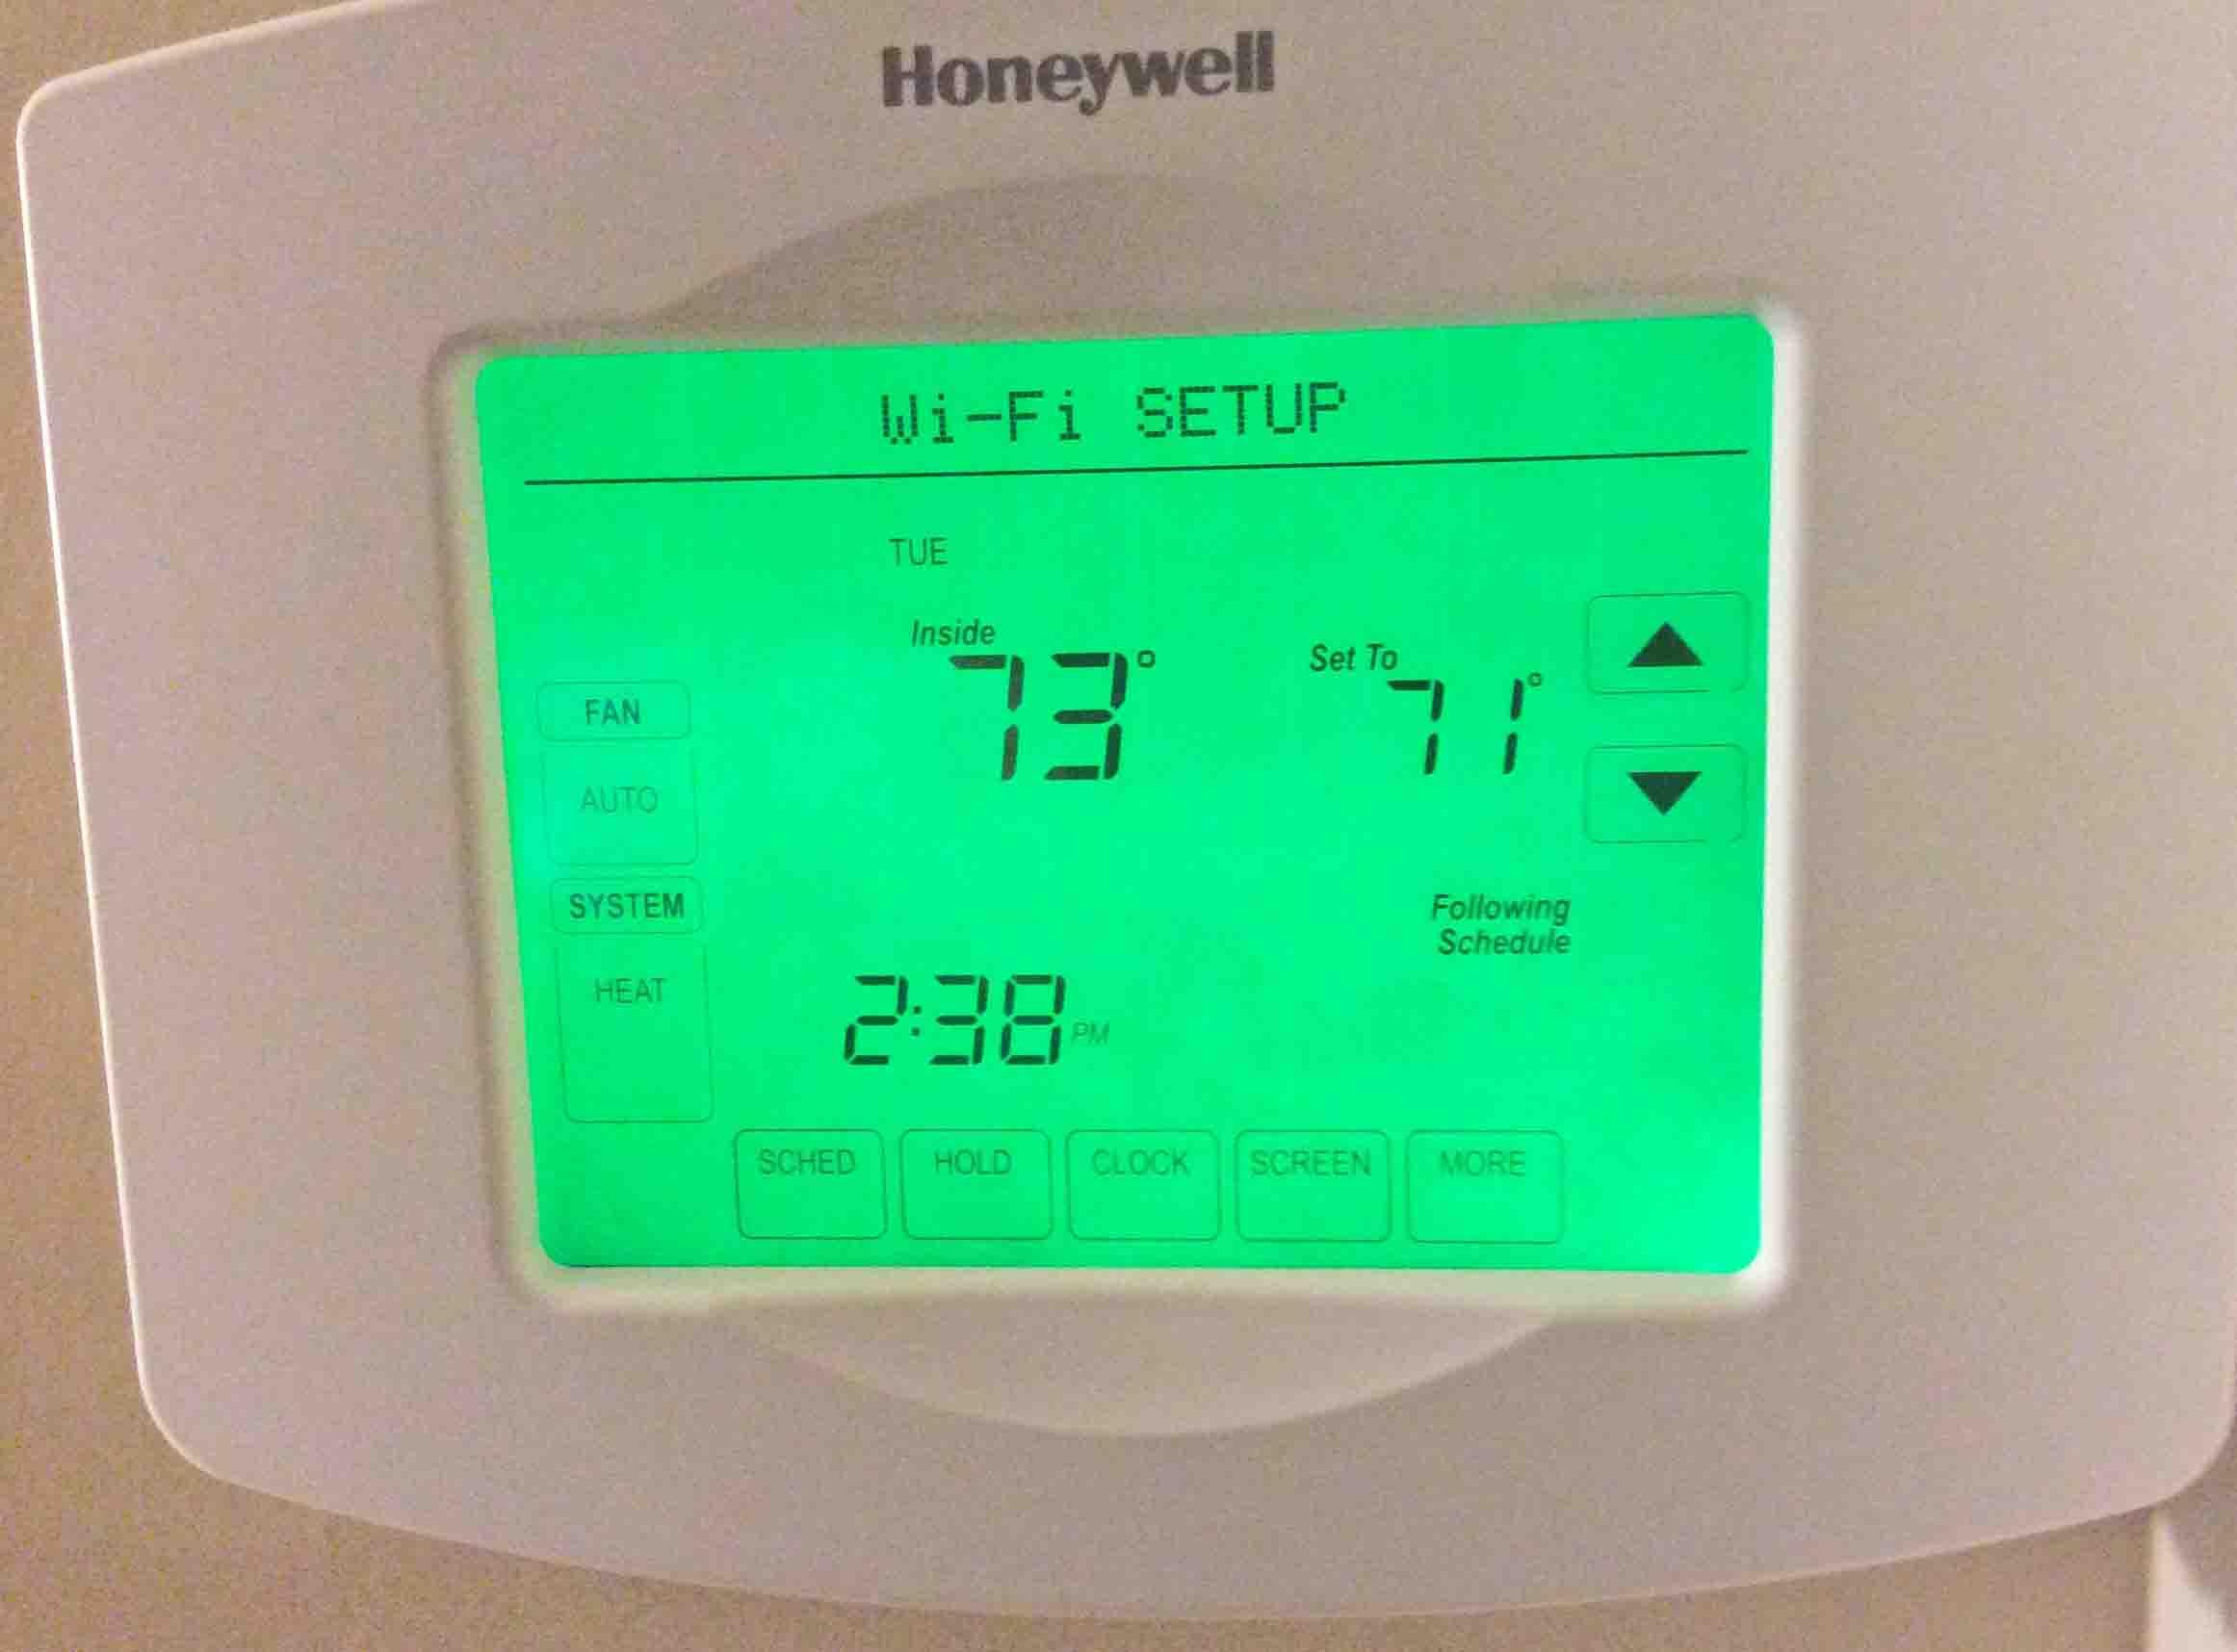 Change Wireless Network on Honeywell WiFi Thermostat